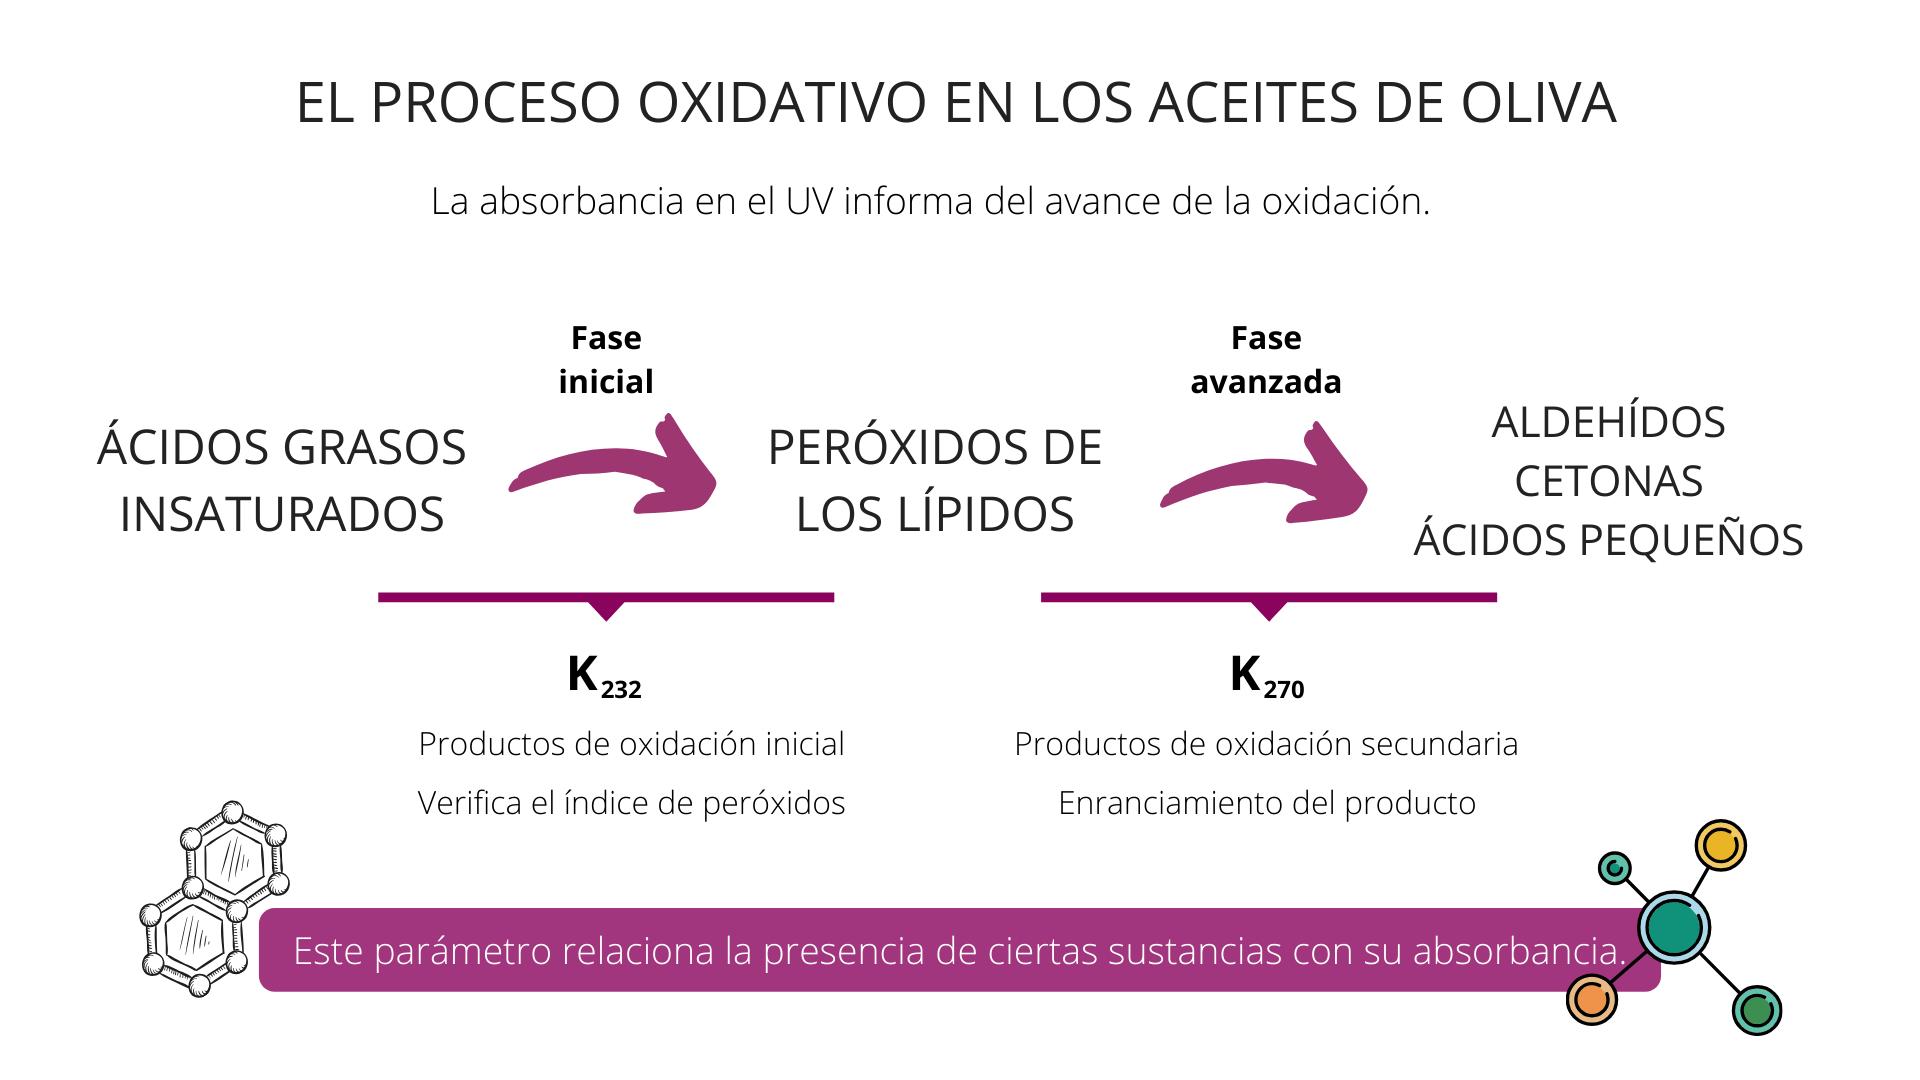 Parámetos analíticos aceites oliva 4